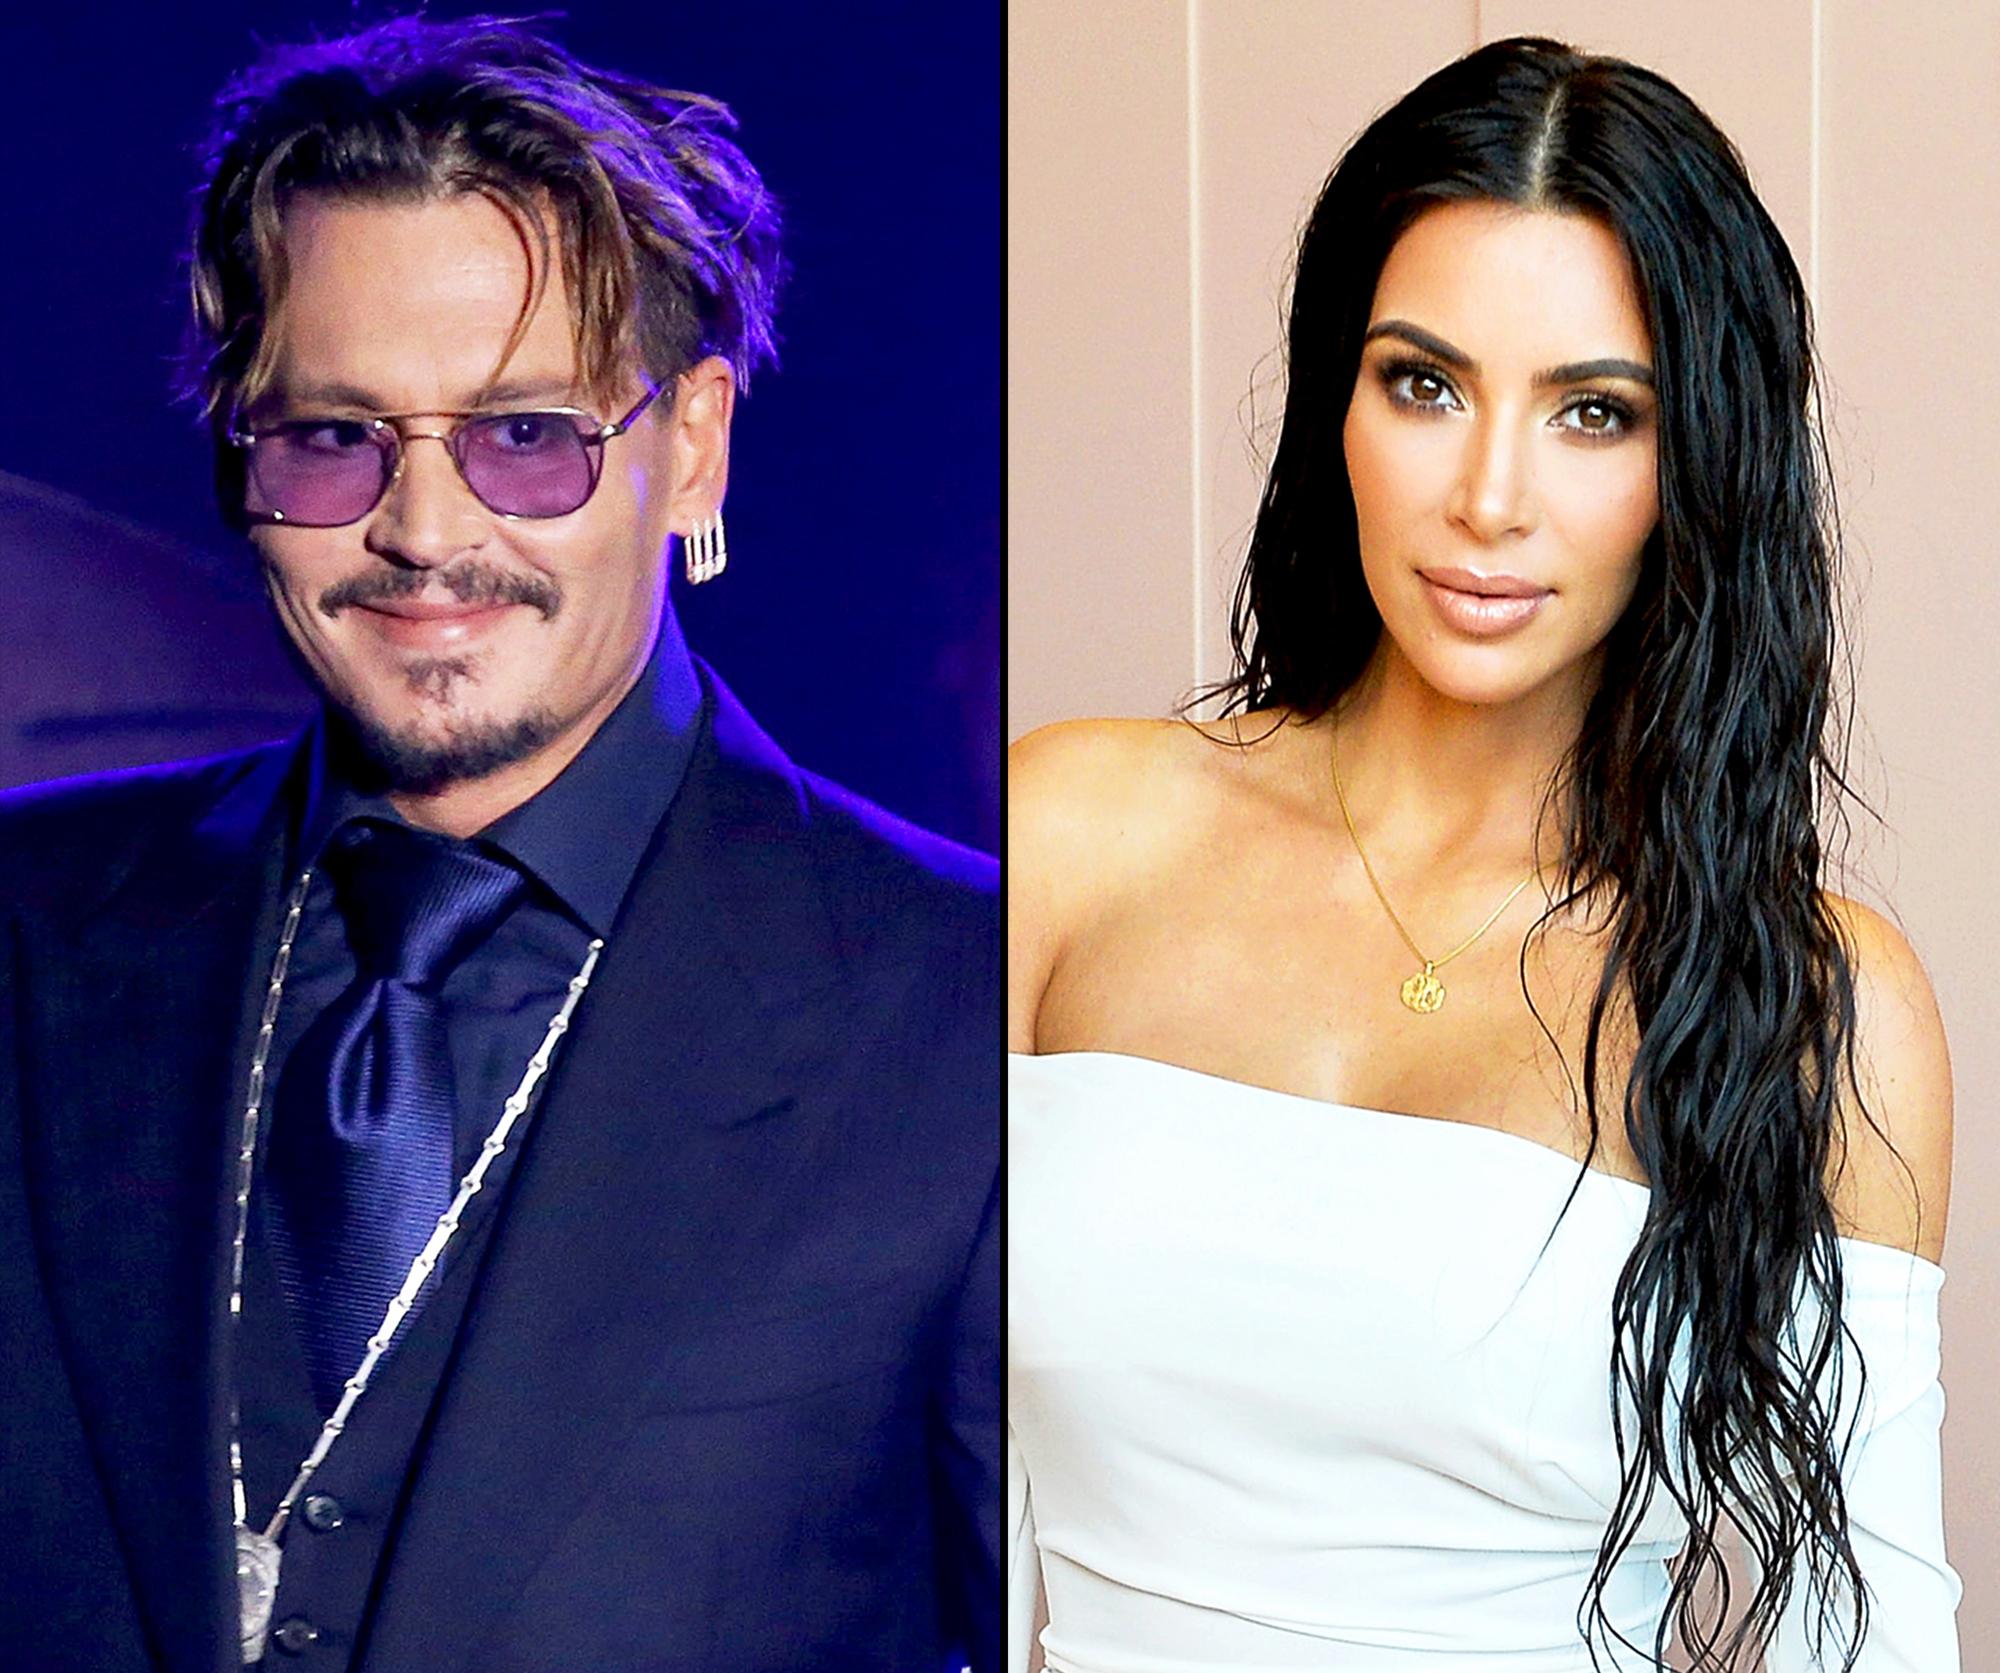 Johnny Depp and Kim Kardashian